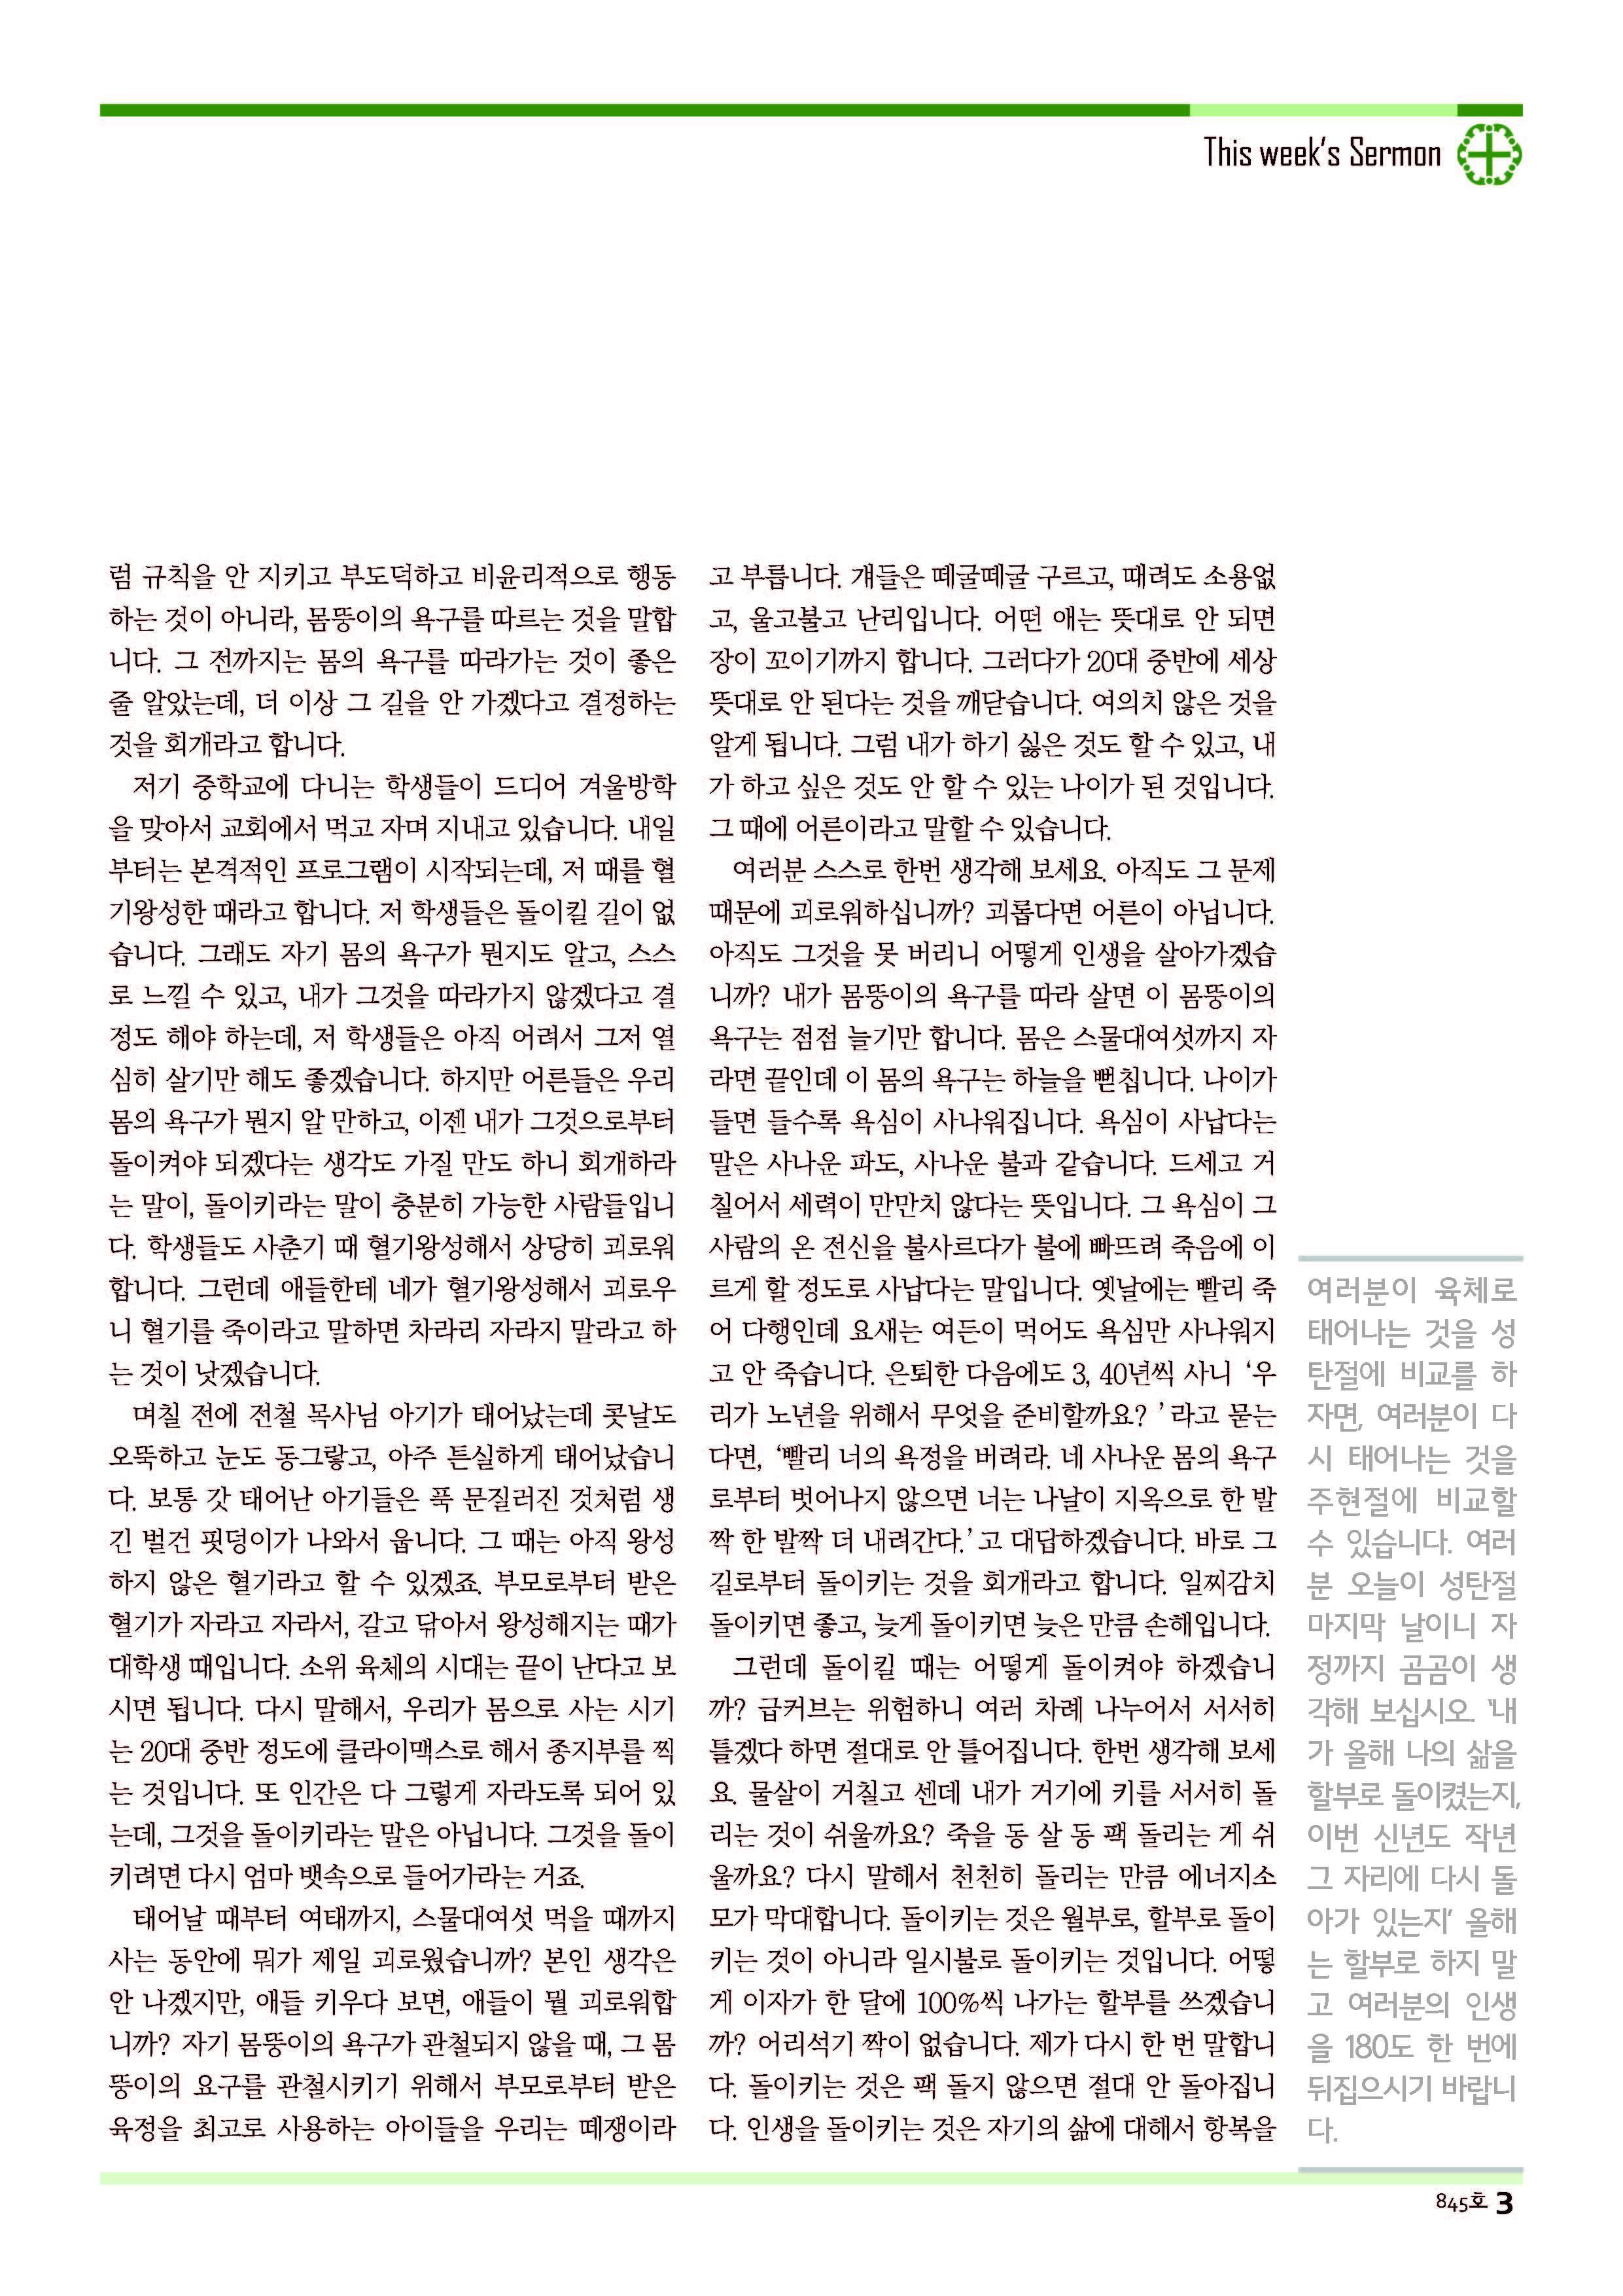 14sdjb0112_페이지_03.jpg